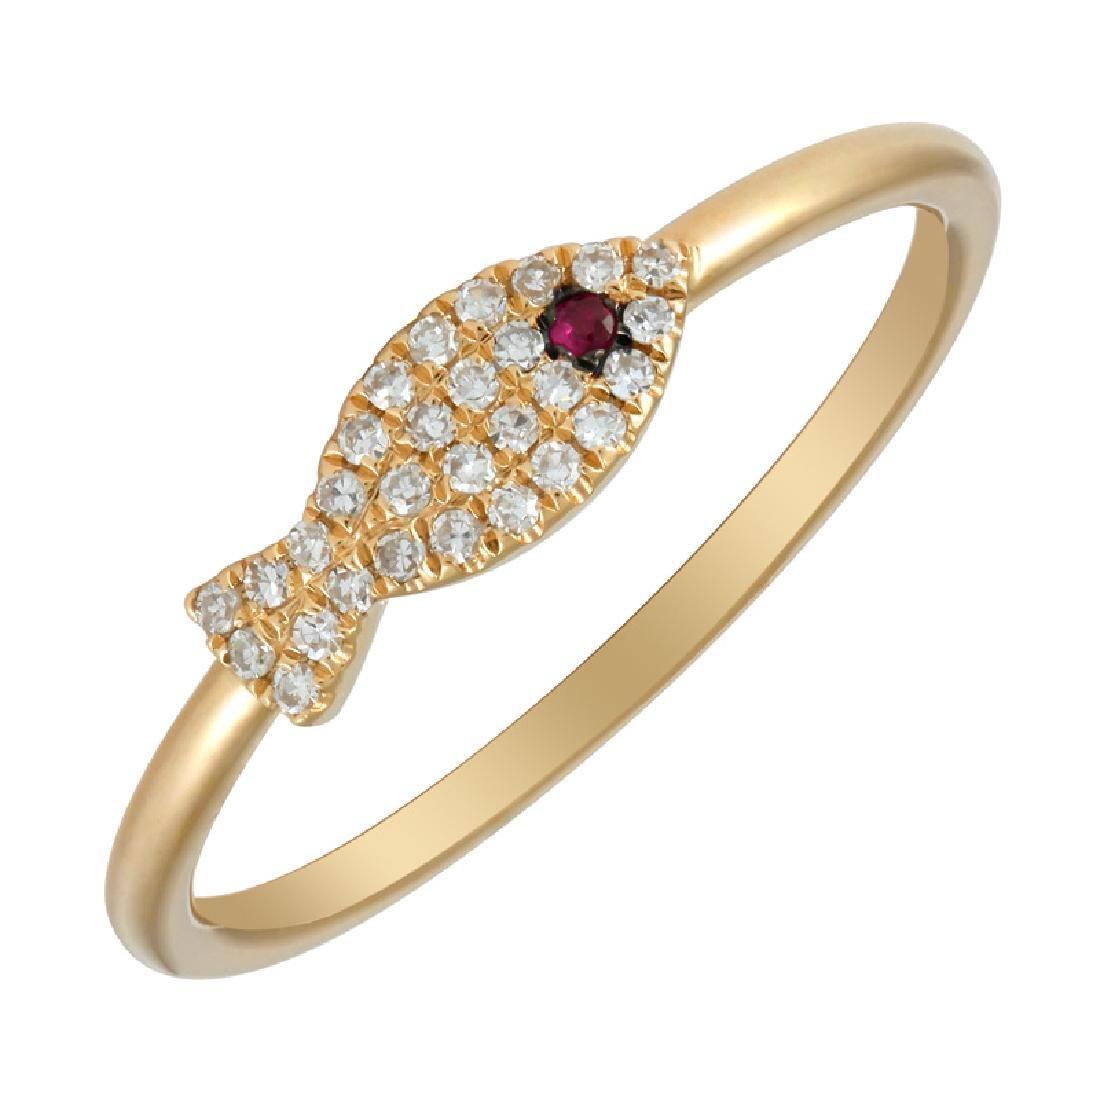 14KT Yellow Gold Women's Diamond Ring